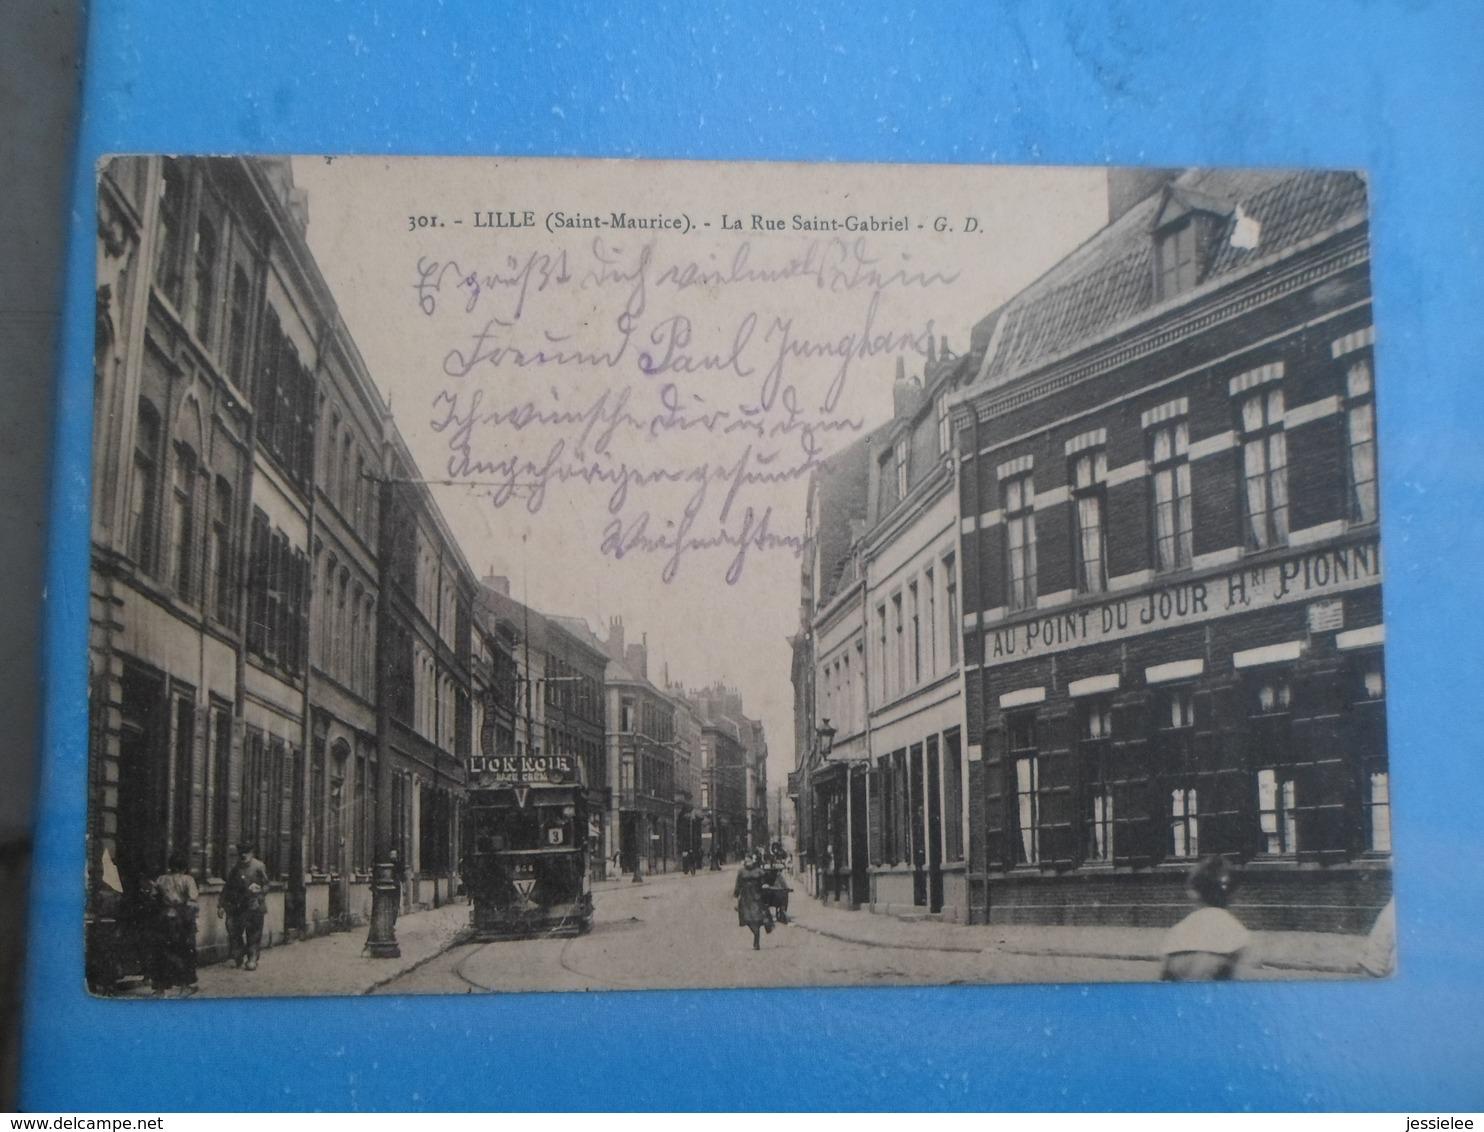 Carte Postale Lille Saint Maurice, La Rue Saint Gabriel, Tramway, Commerce - Strassenbahnen